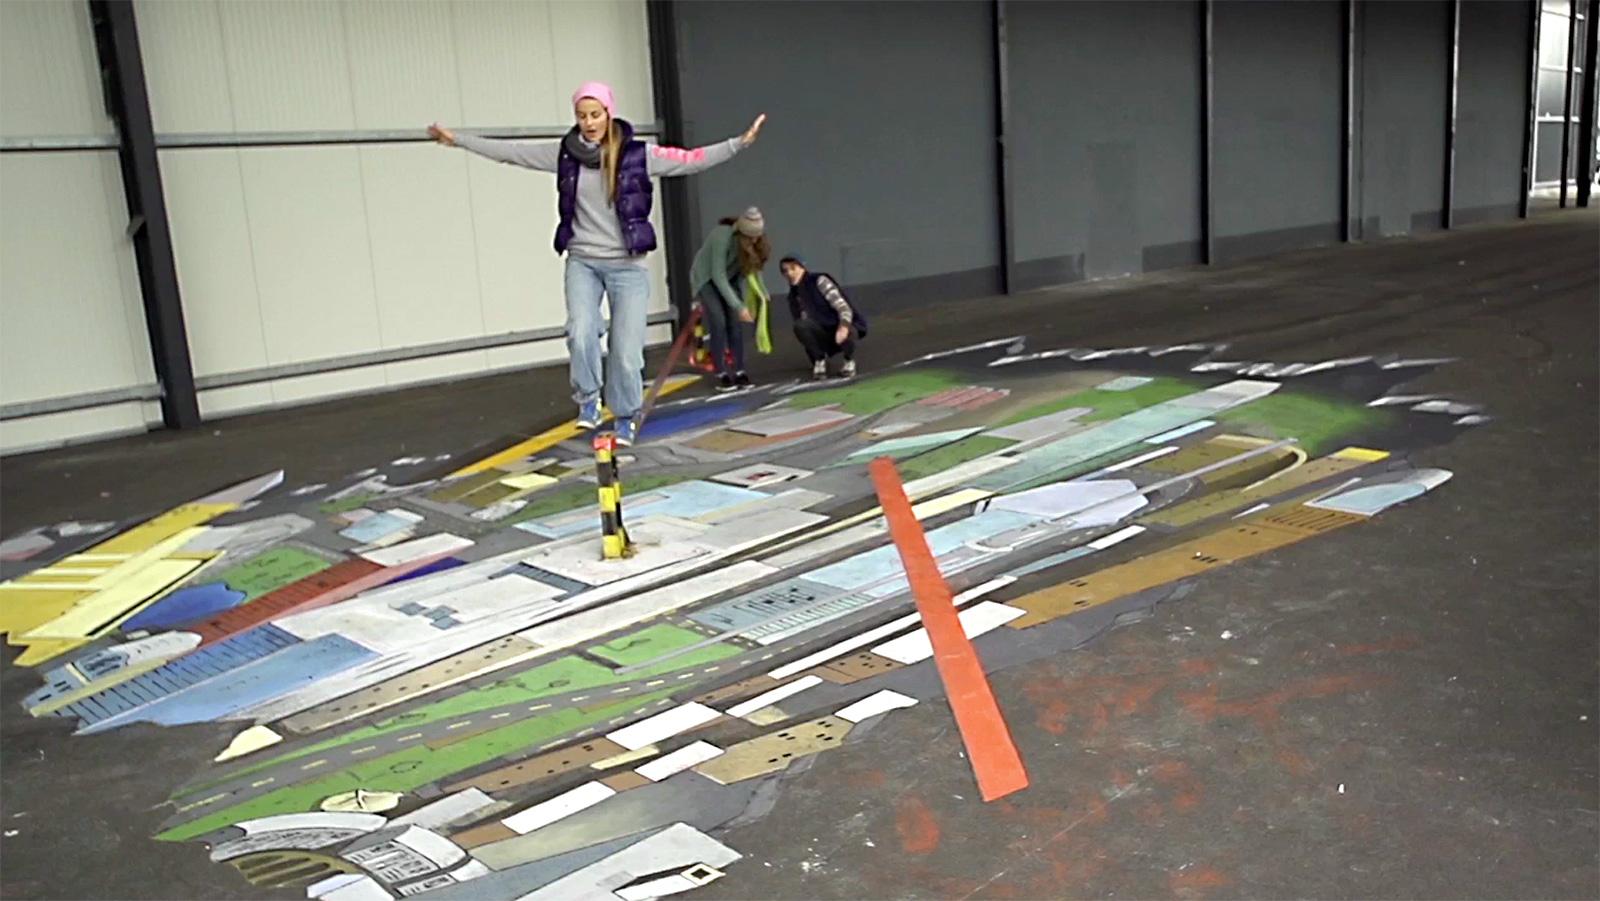 streetart Illusionsmalerei Anamorphose O2 Werbung